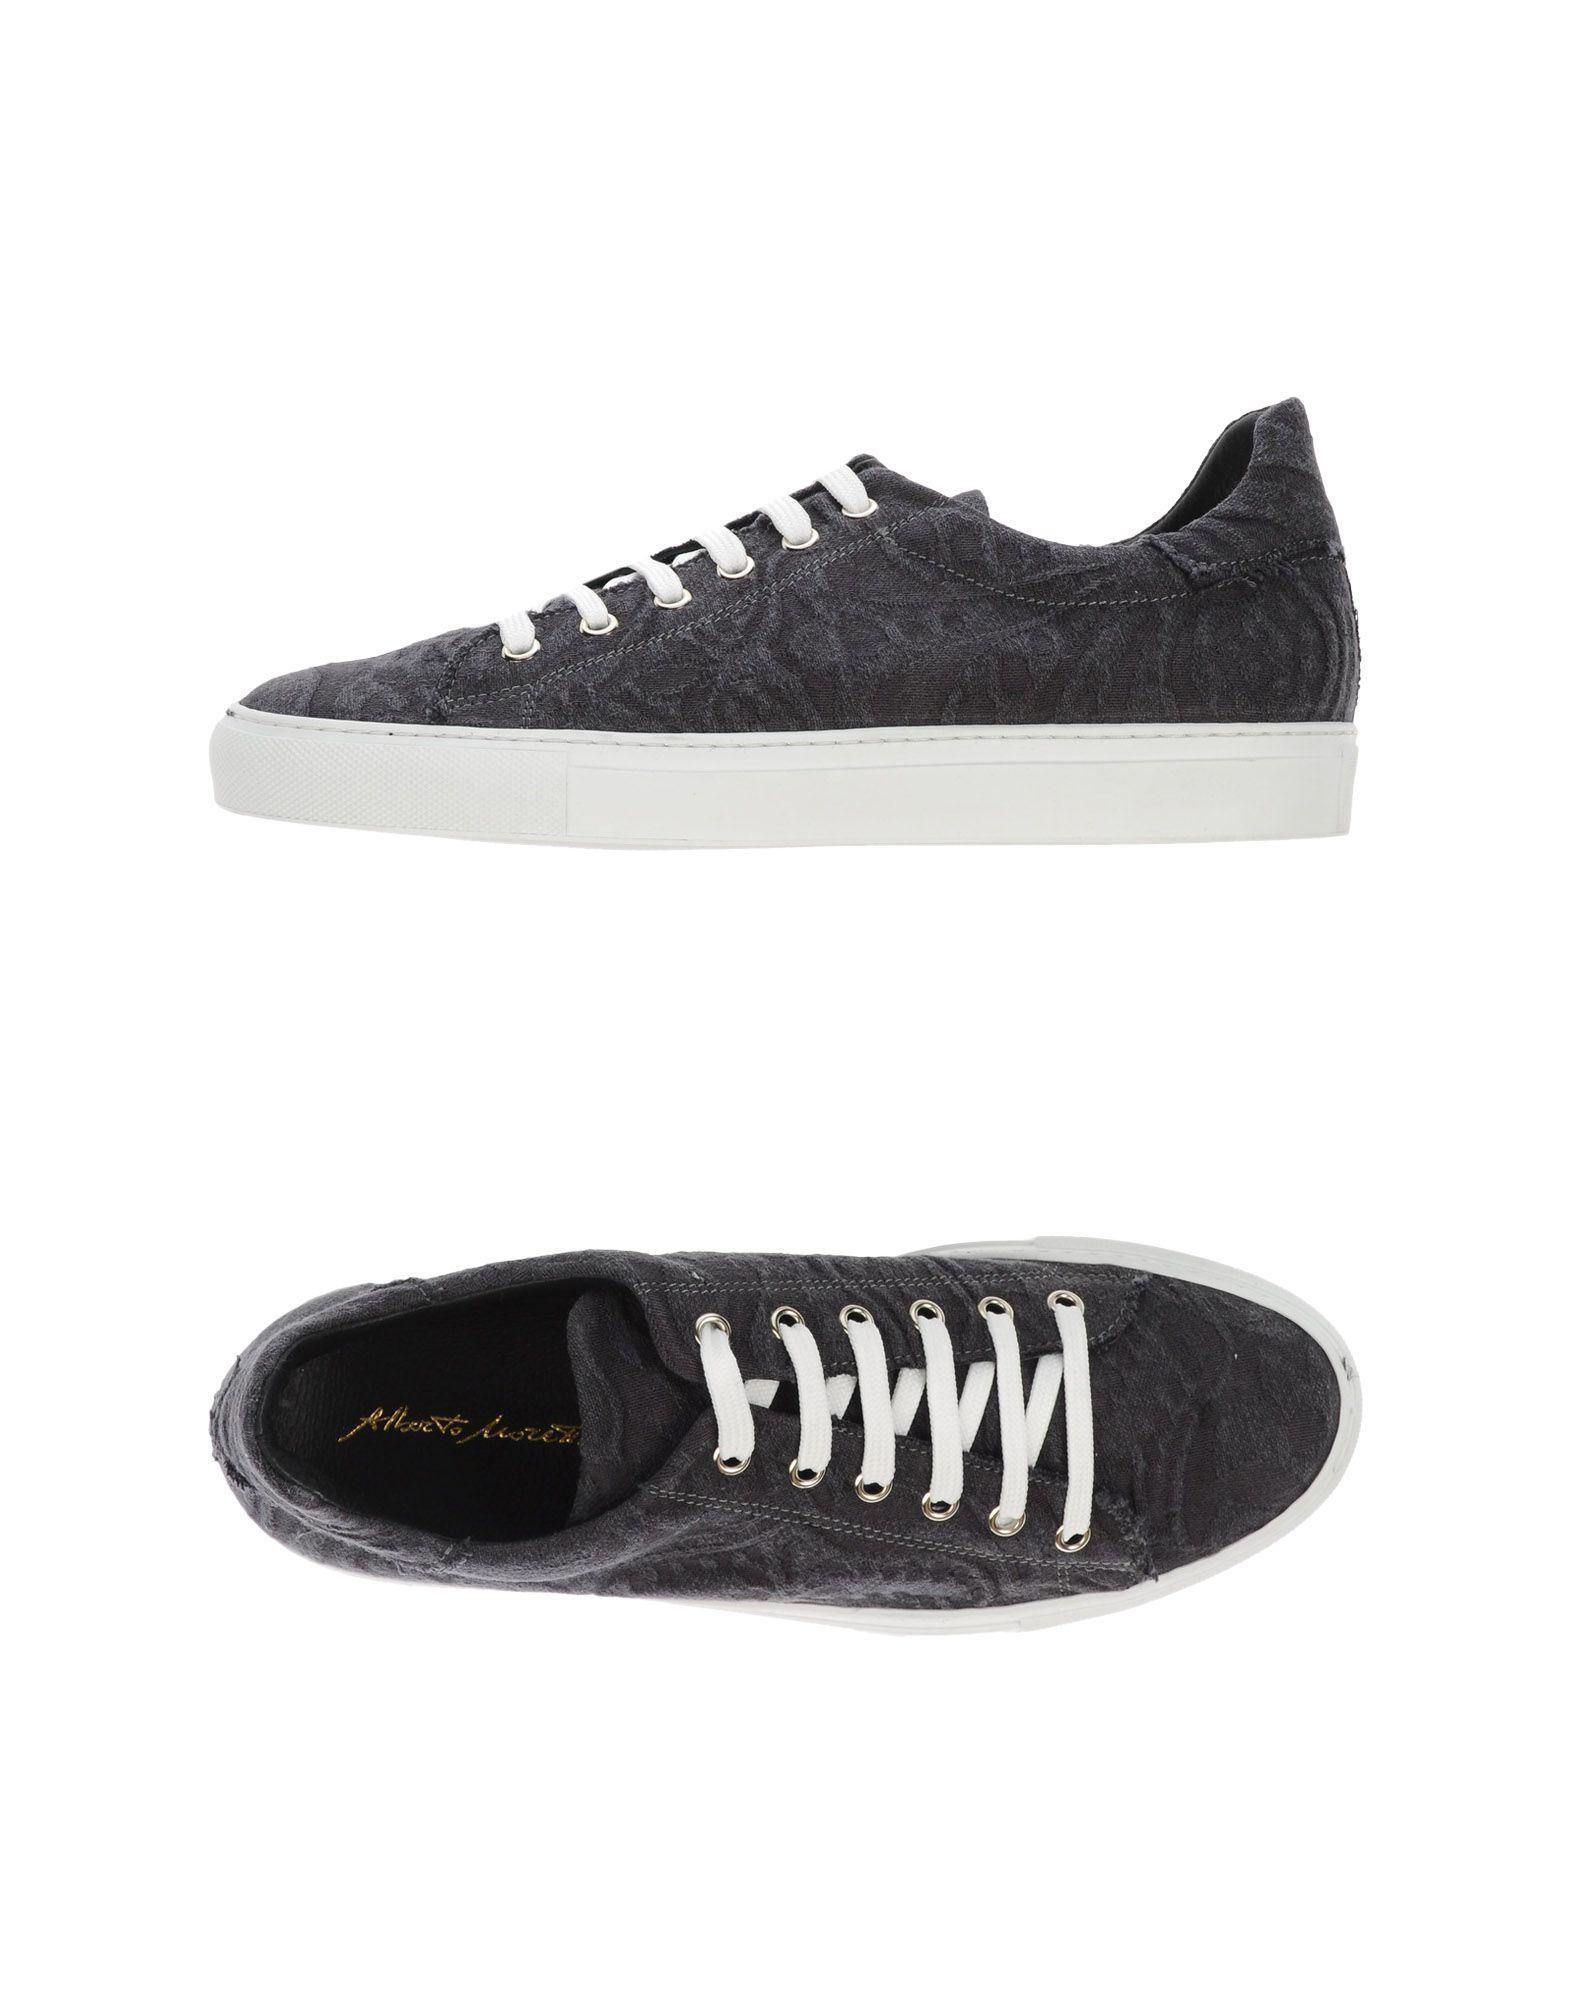 FOOTWEAR - Low-tops & sneakers Alberto Moretti s4tWKagl1j